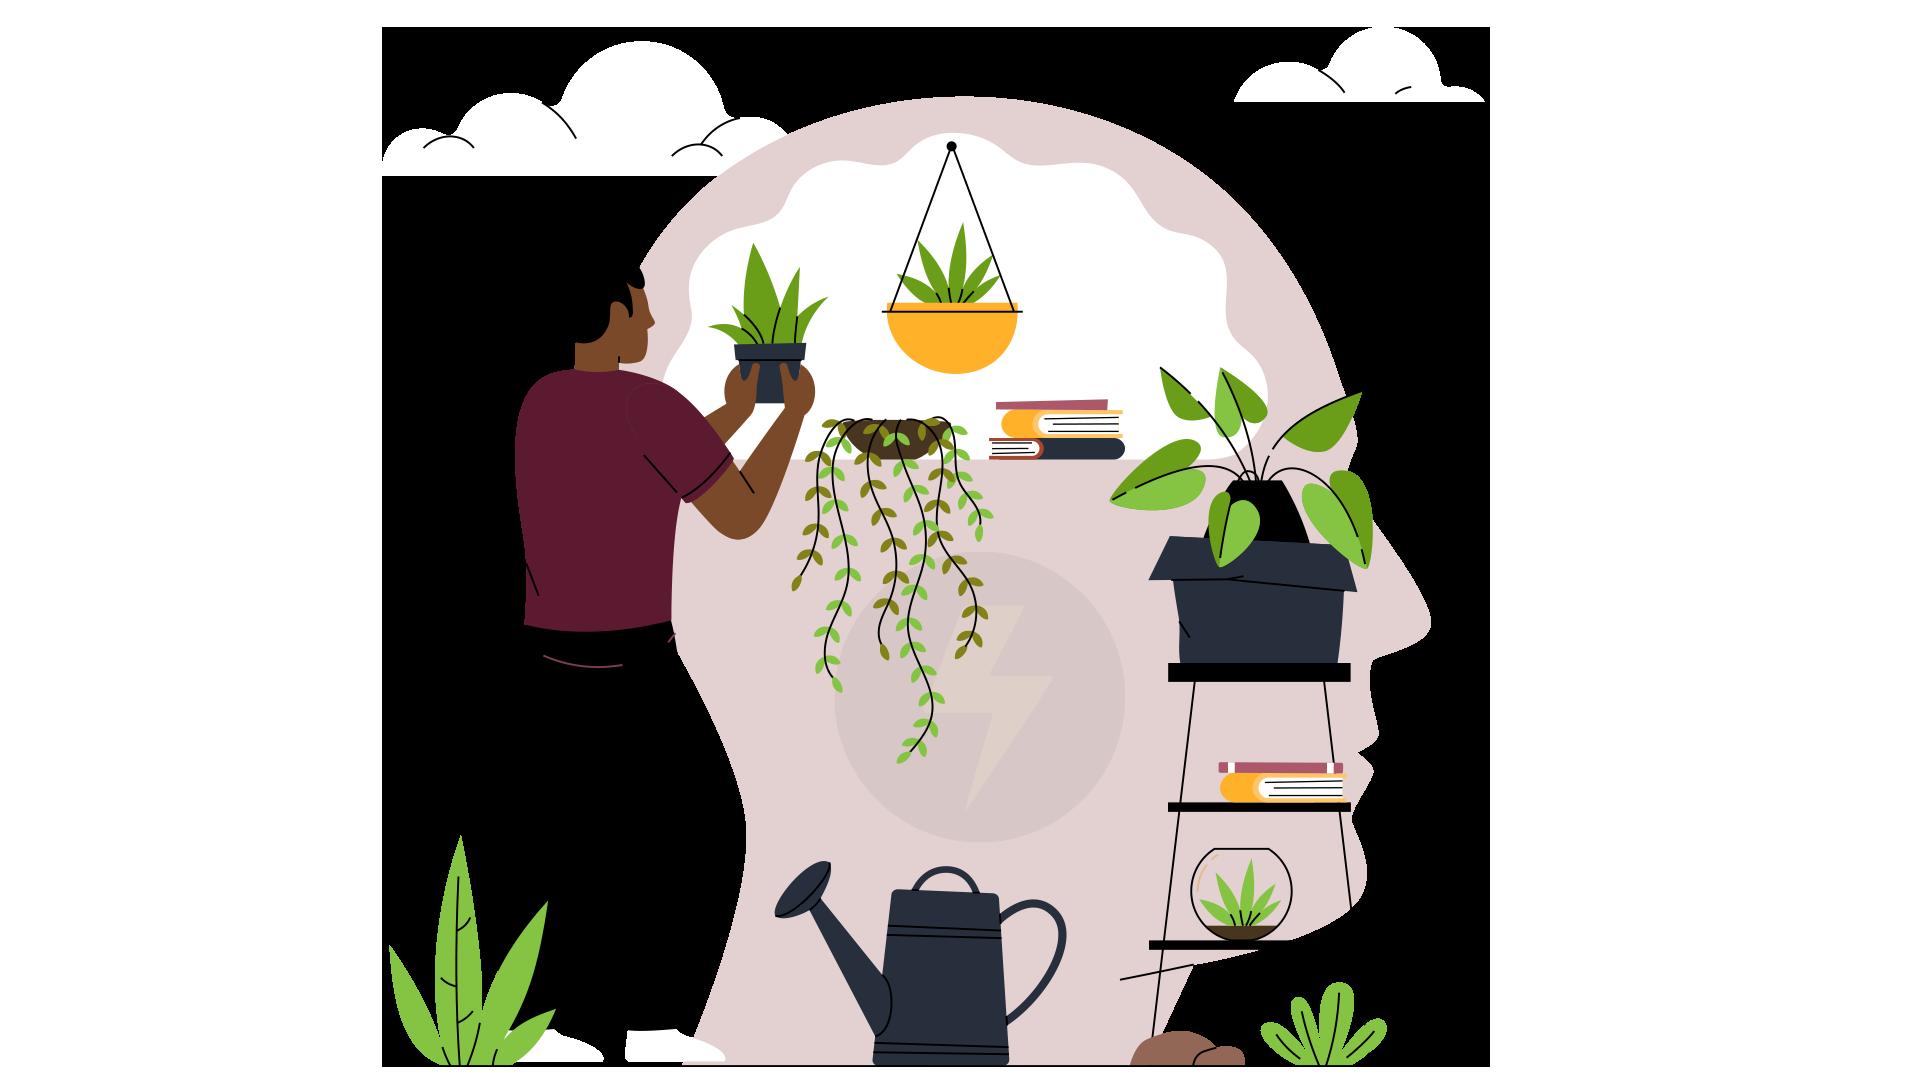 Wakilisha-creative-enterprise-2021-visual-trends-simplified-life-wellness-mindfulness